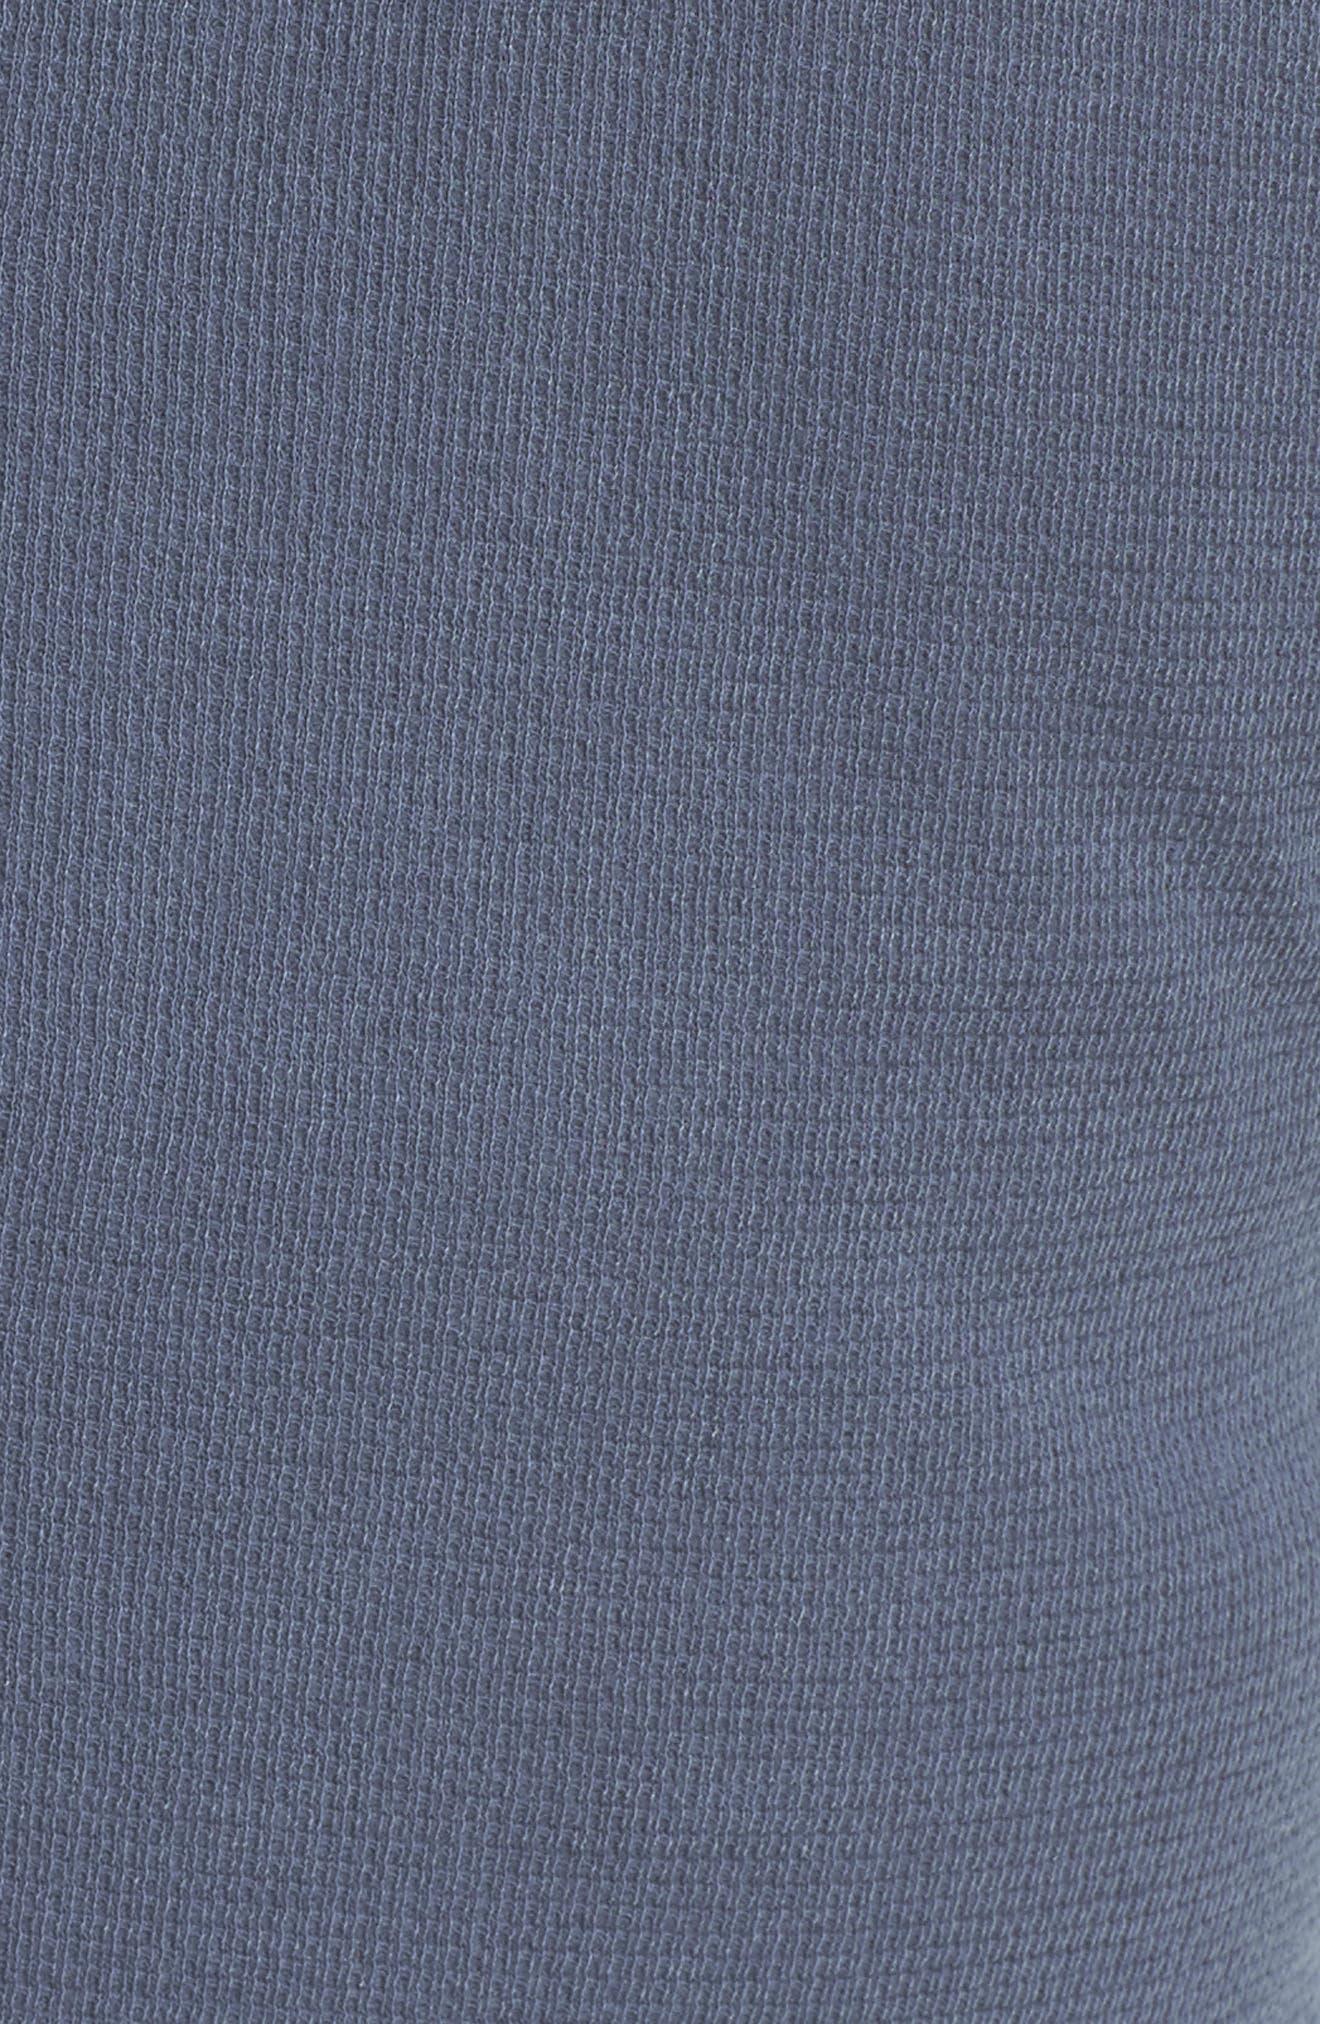 Lace-Up Bib Thermal Top,                             Alternate thumbnail 14, color,